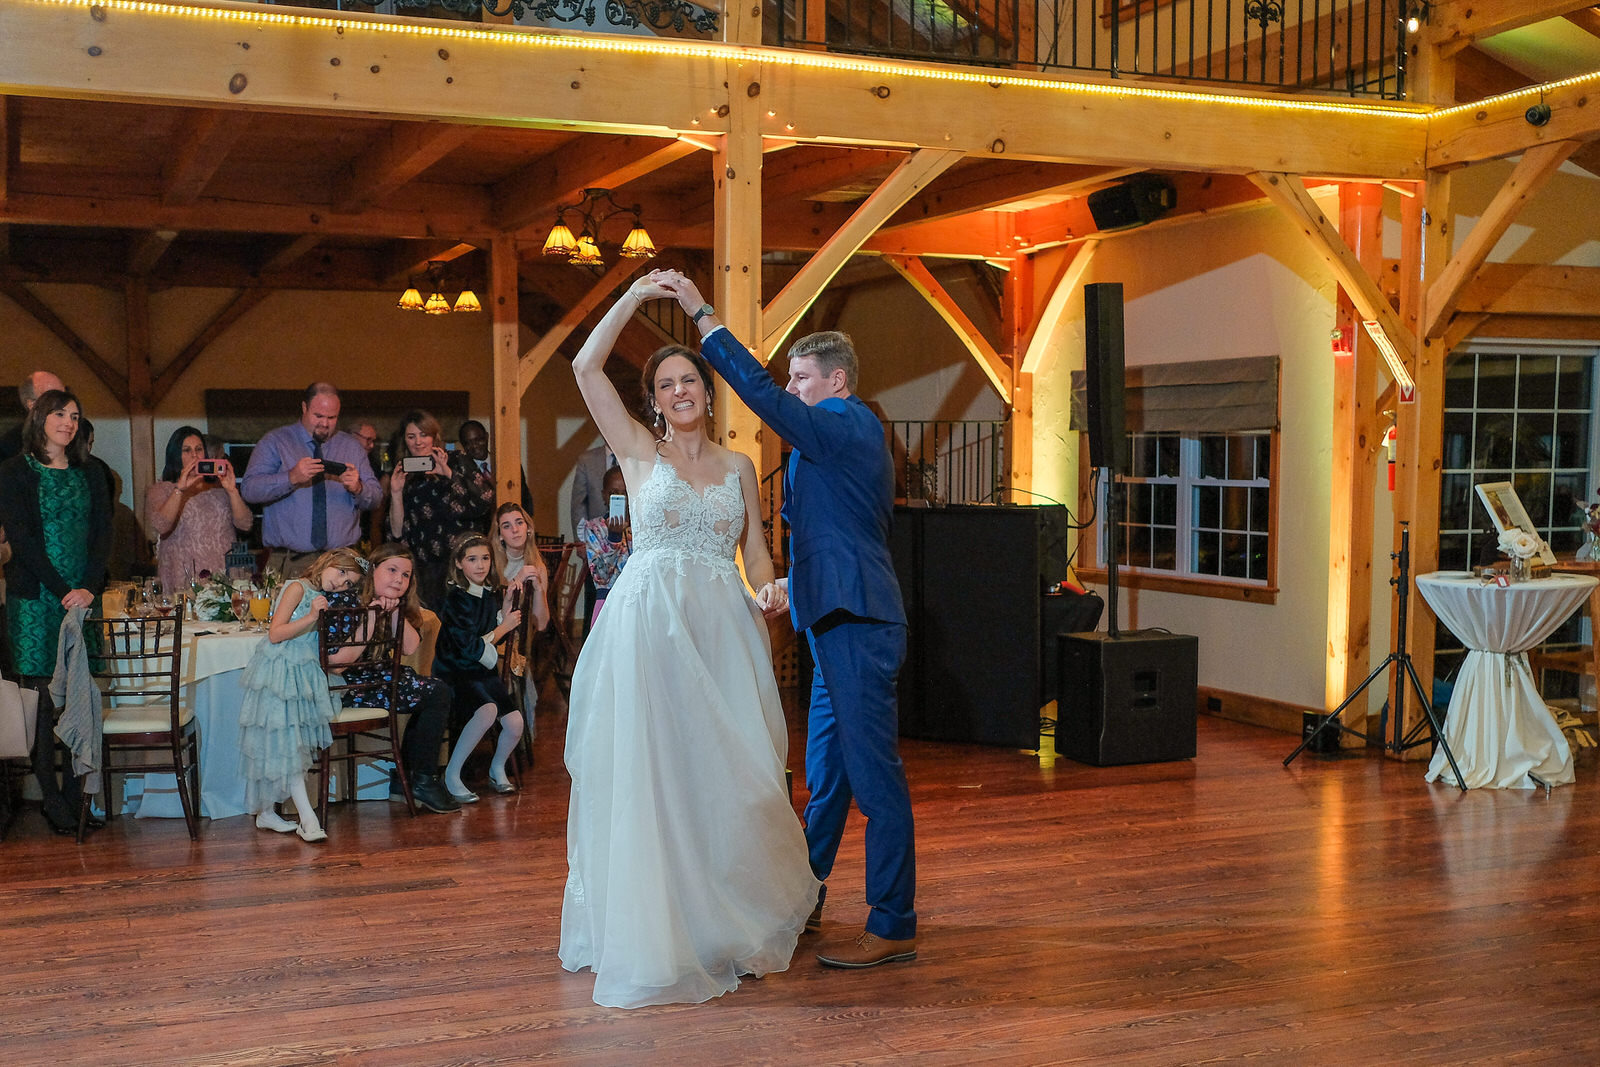 Zorvino-Vineyards-Fall-Wedding-Photography-704.jpg